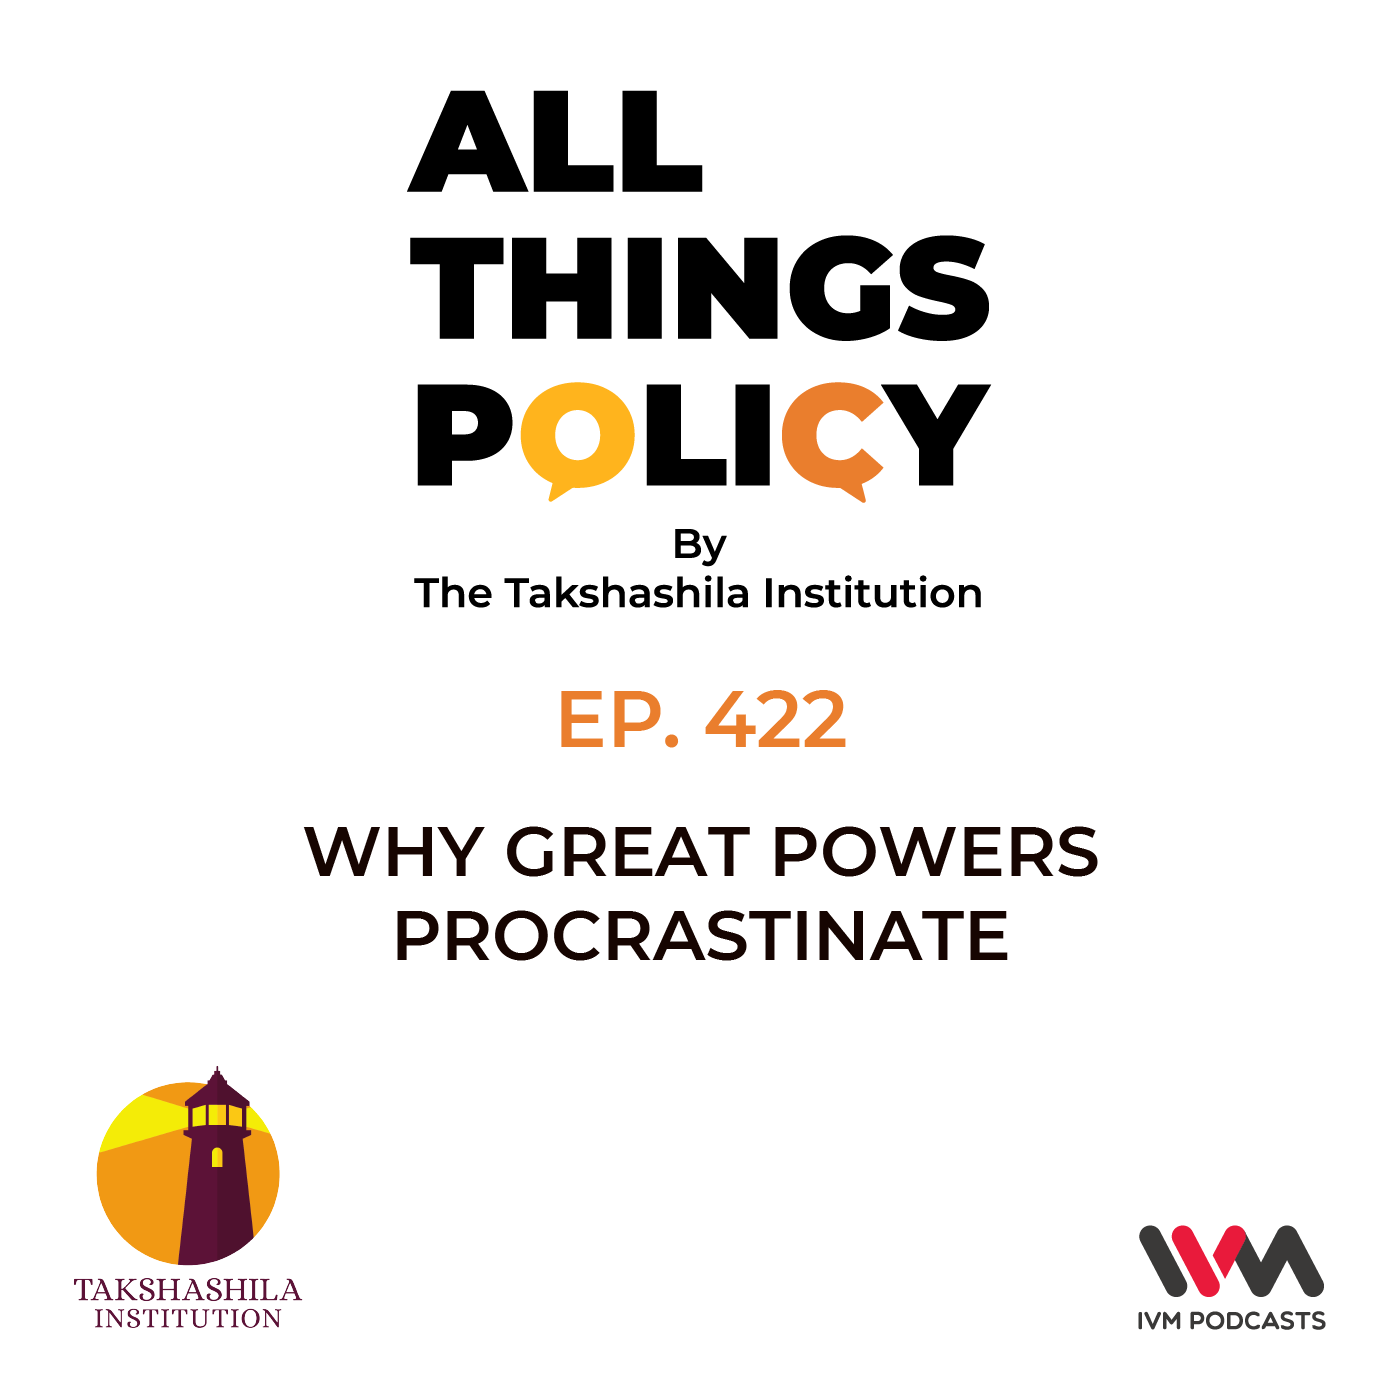 Ep. 422: Why Great Powers Procrastinate